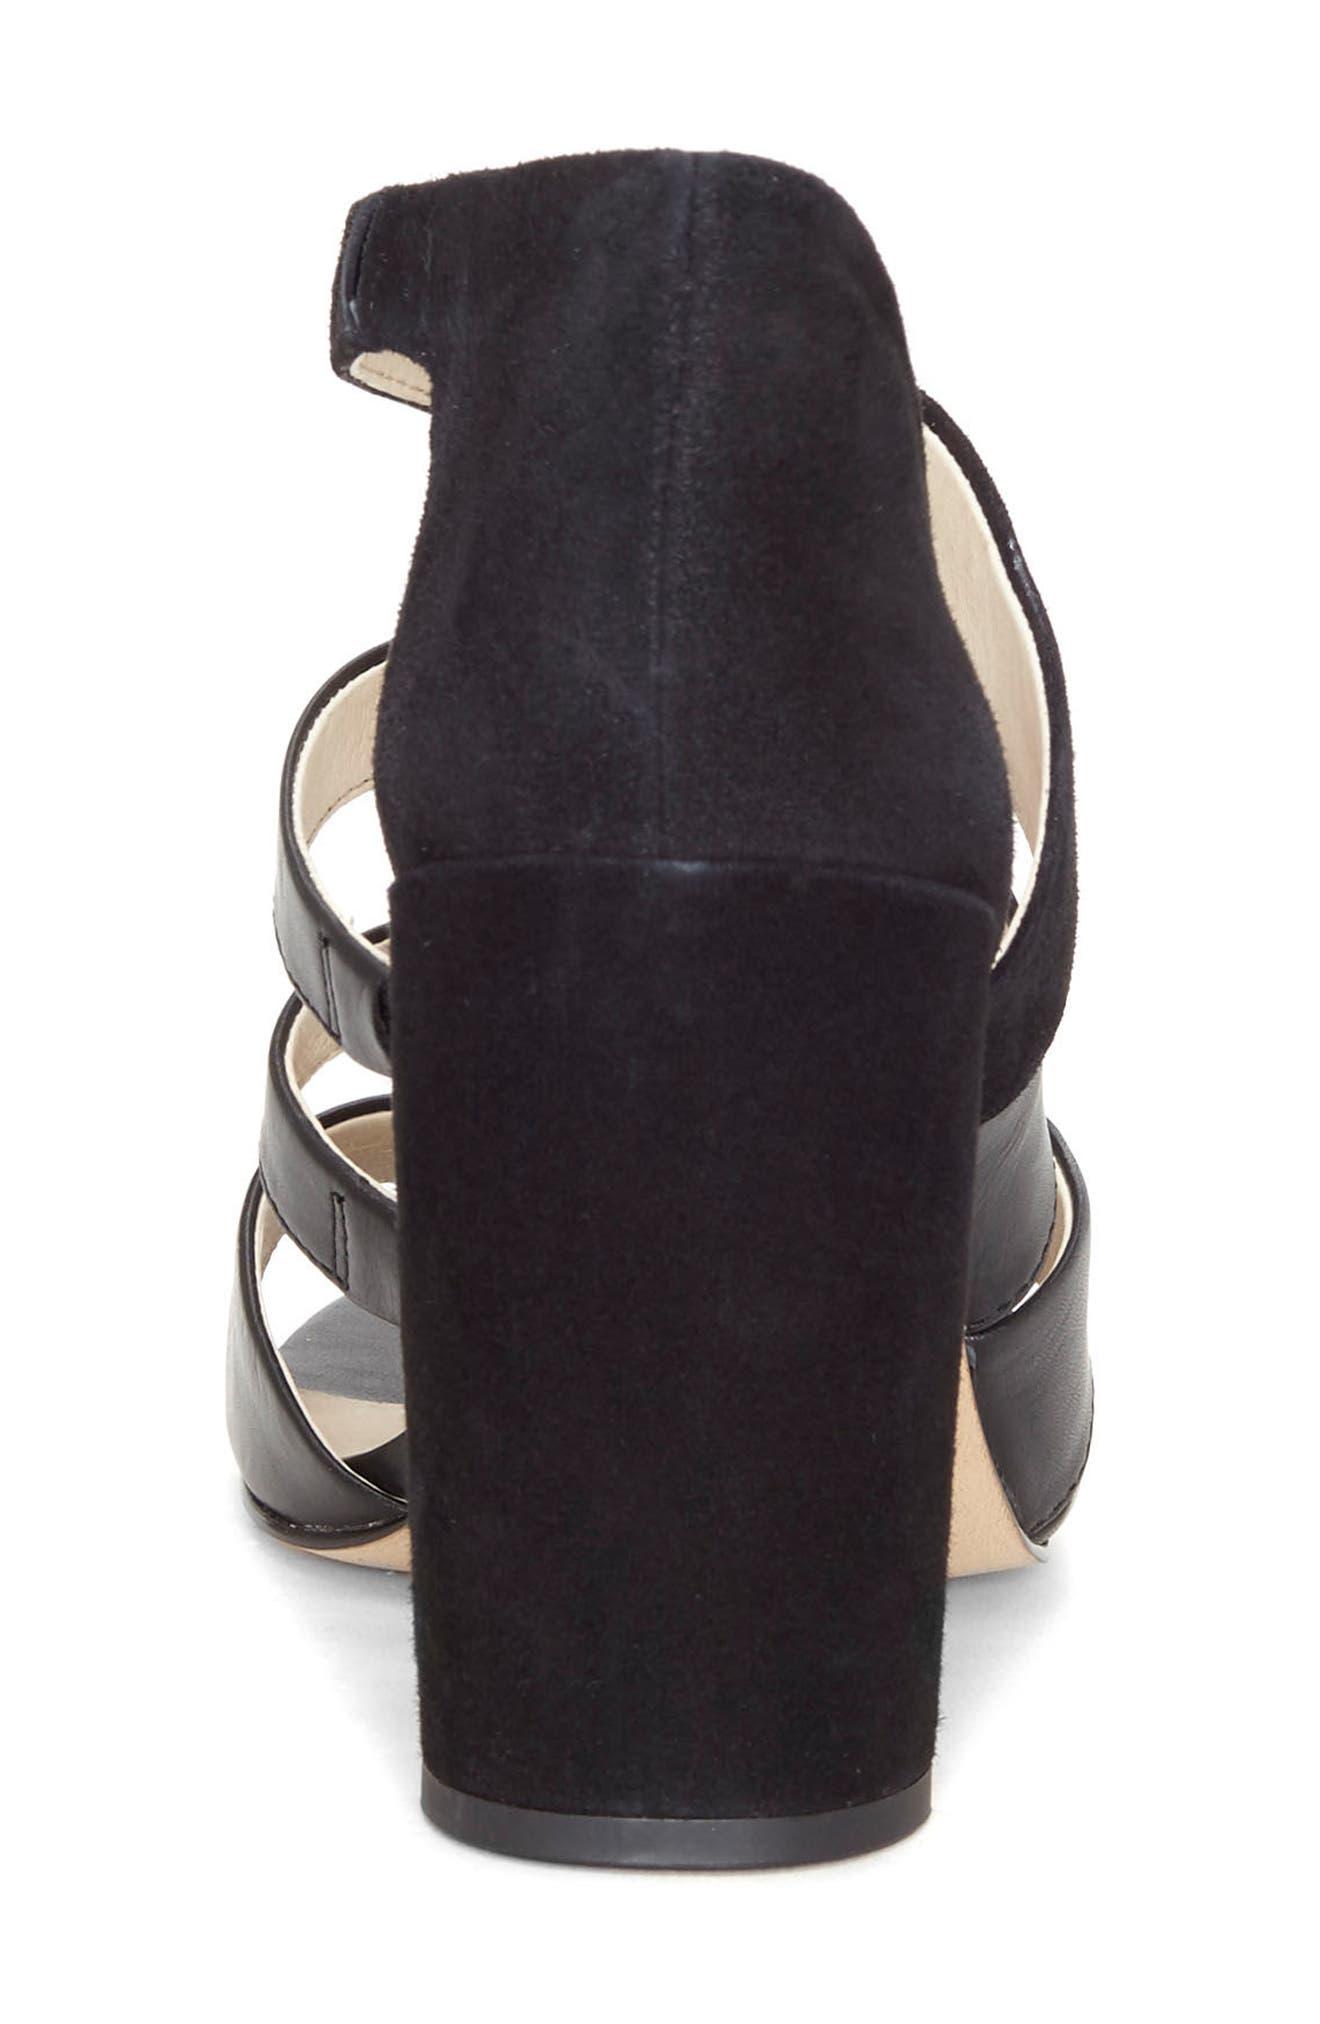 Kainey Strappy Sandal,                             Alternate thumbnail 2, color,                             002